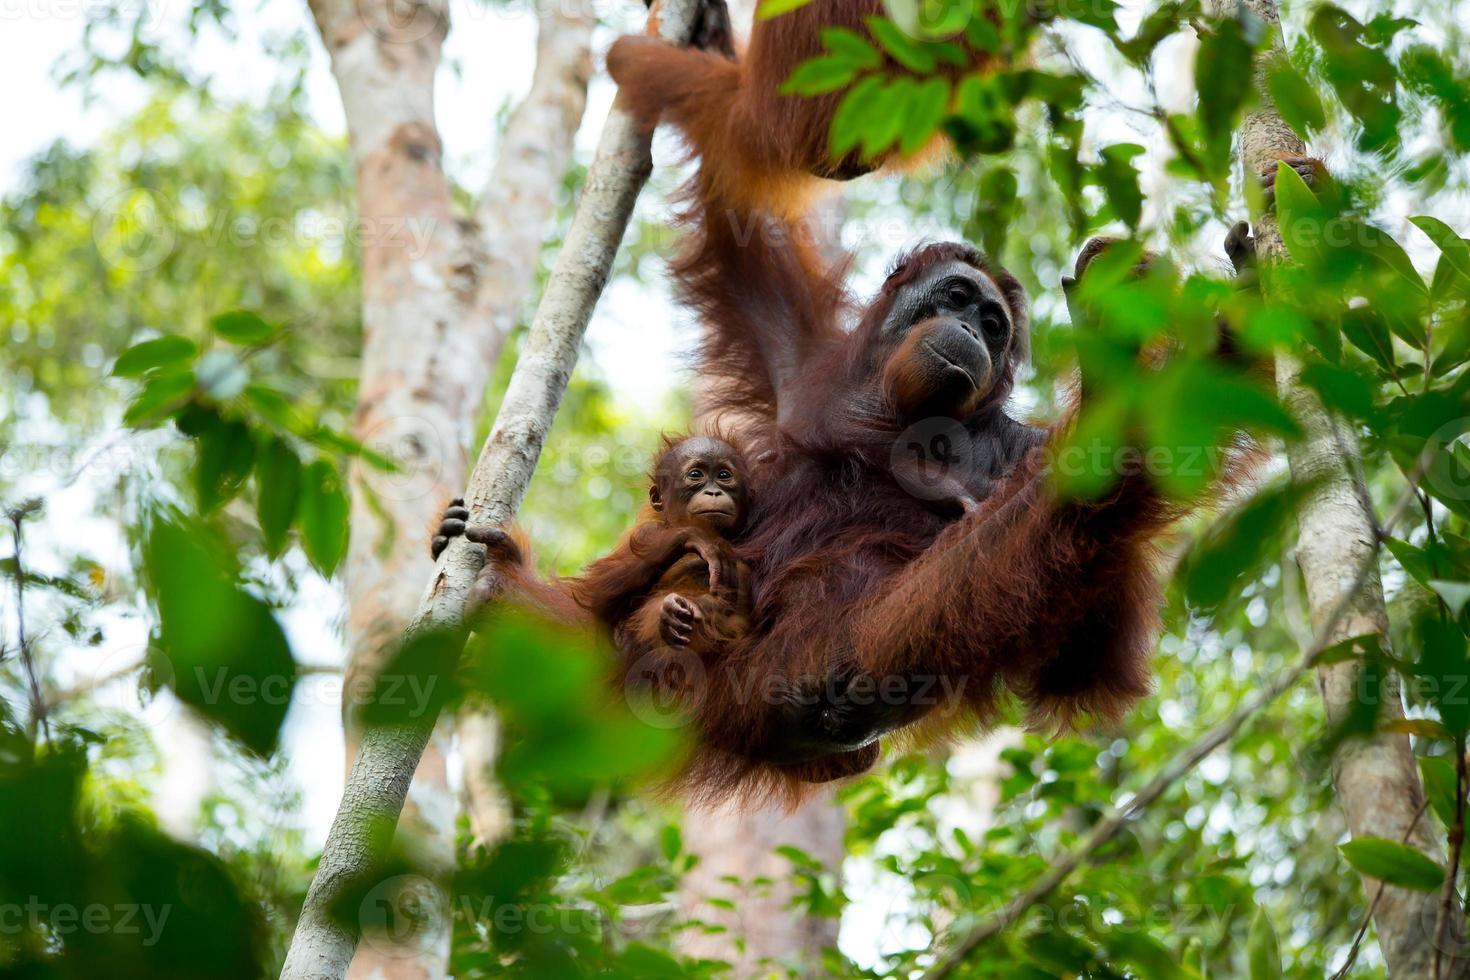 Familia de orangutanes en Borneo, Indonesia. foto